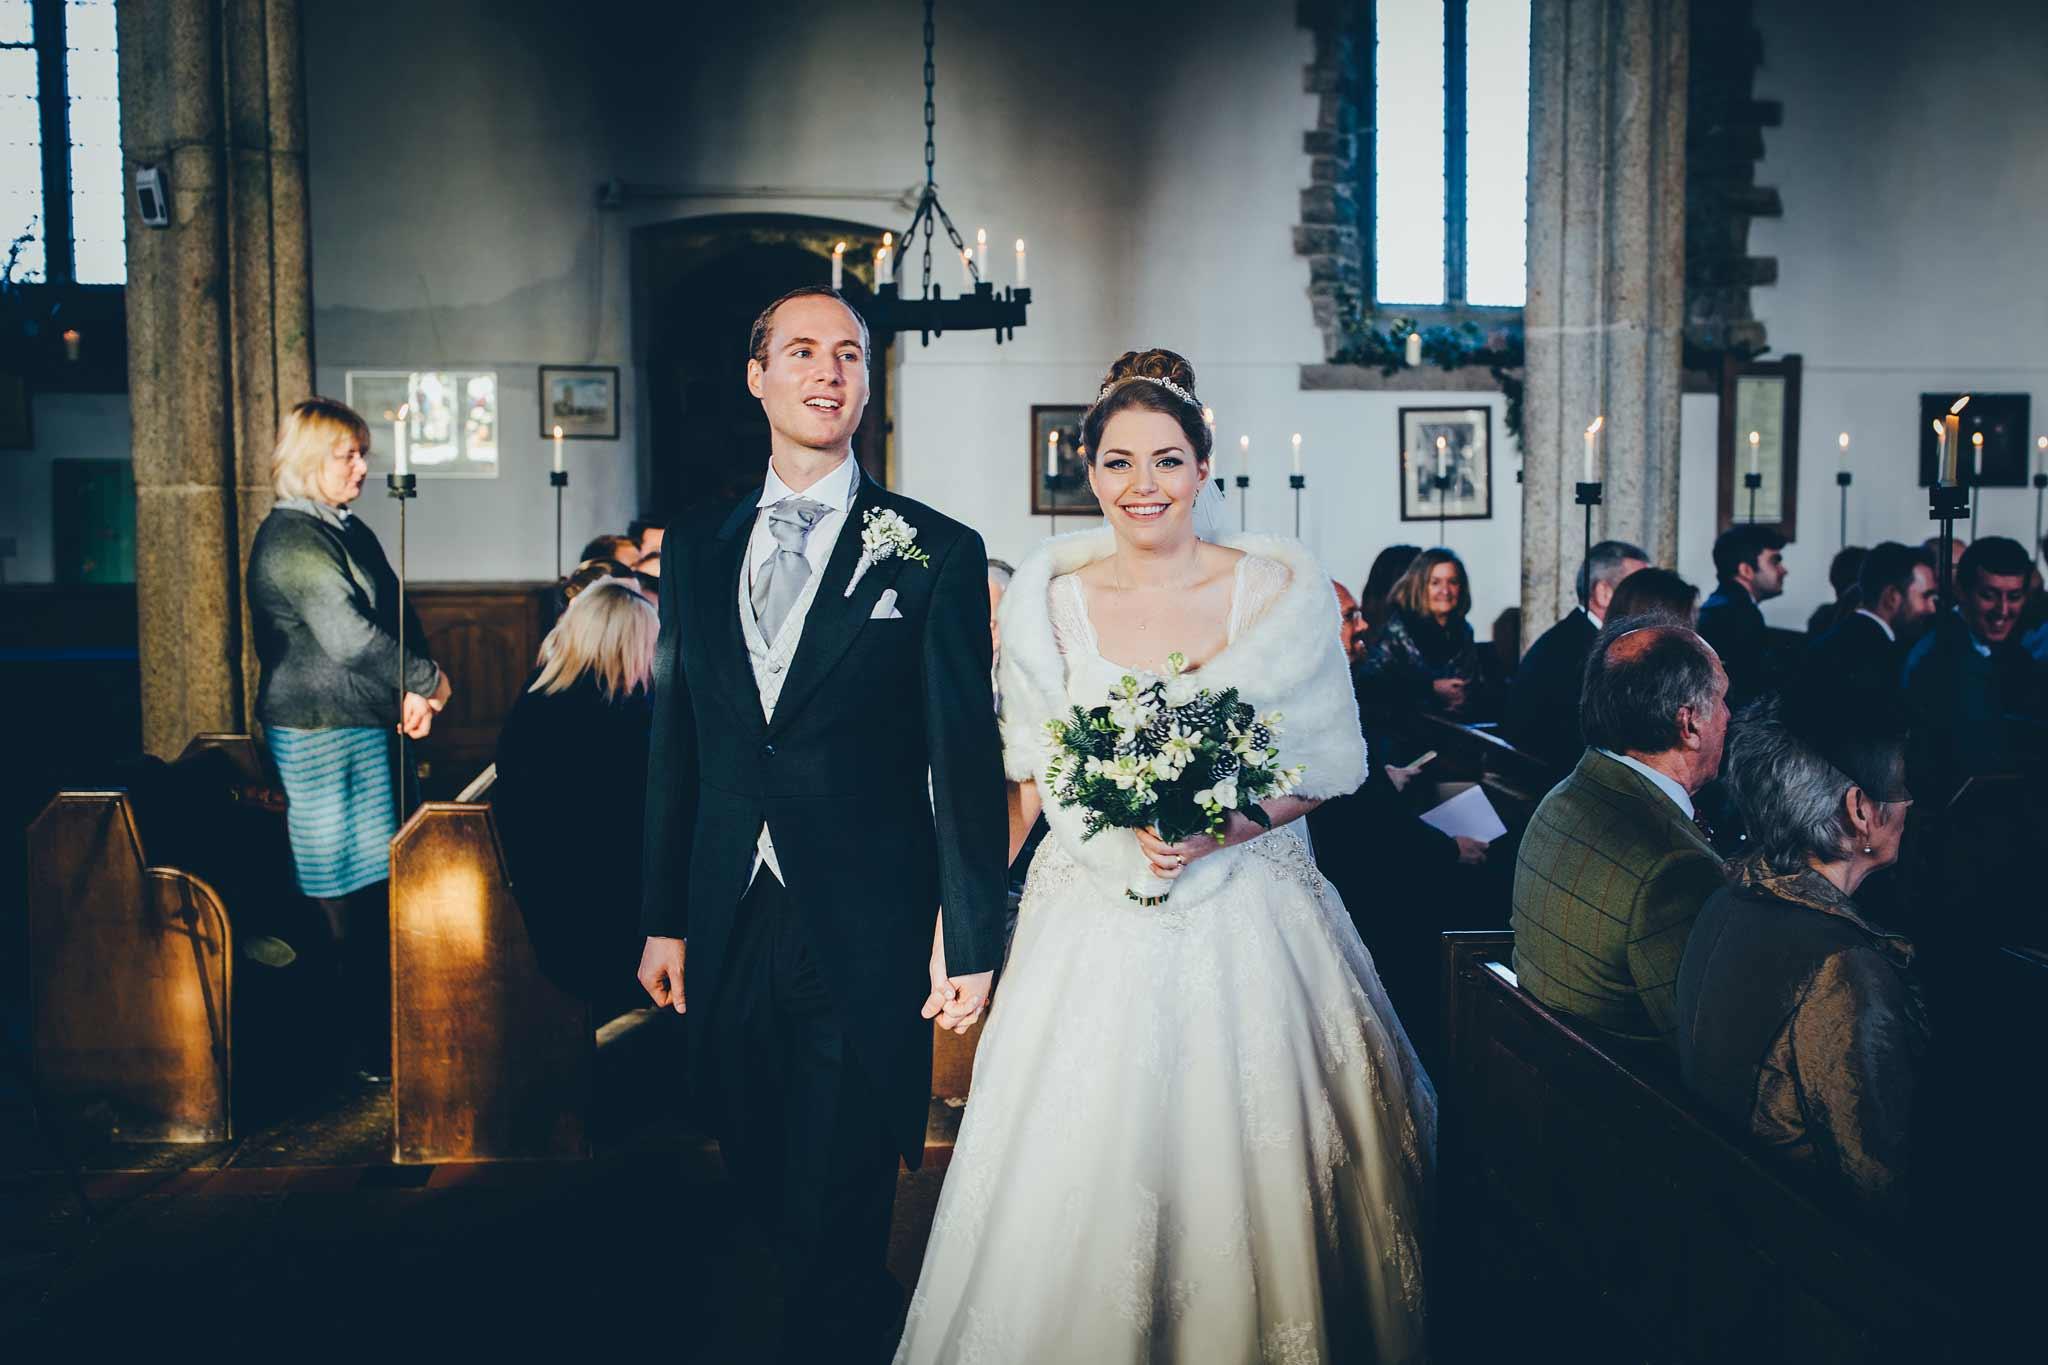 Lands End Hotel Wedding Photographer 8